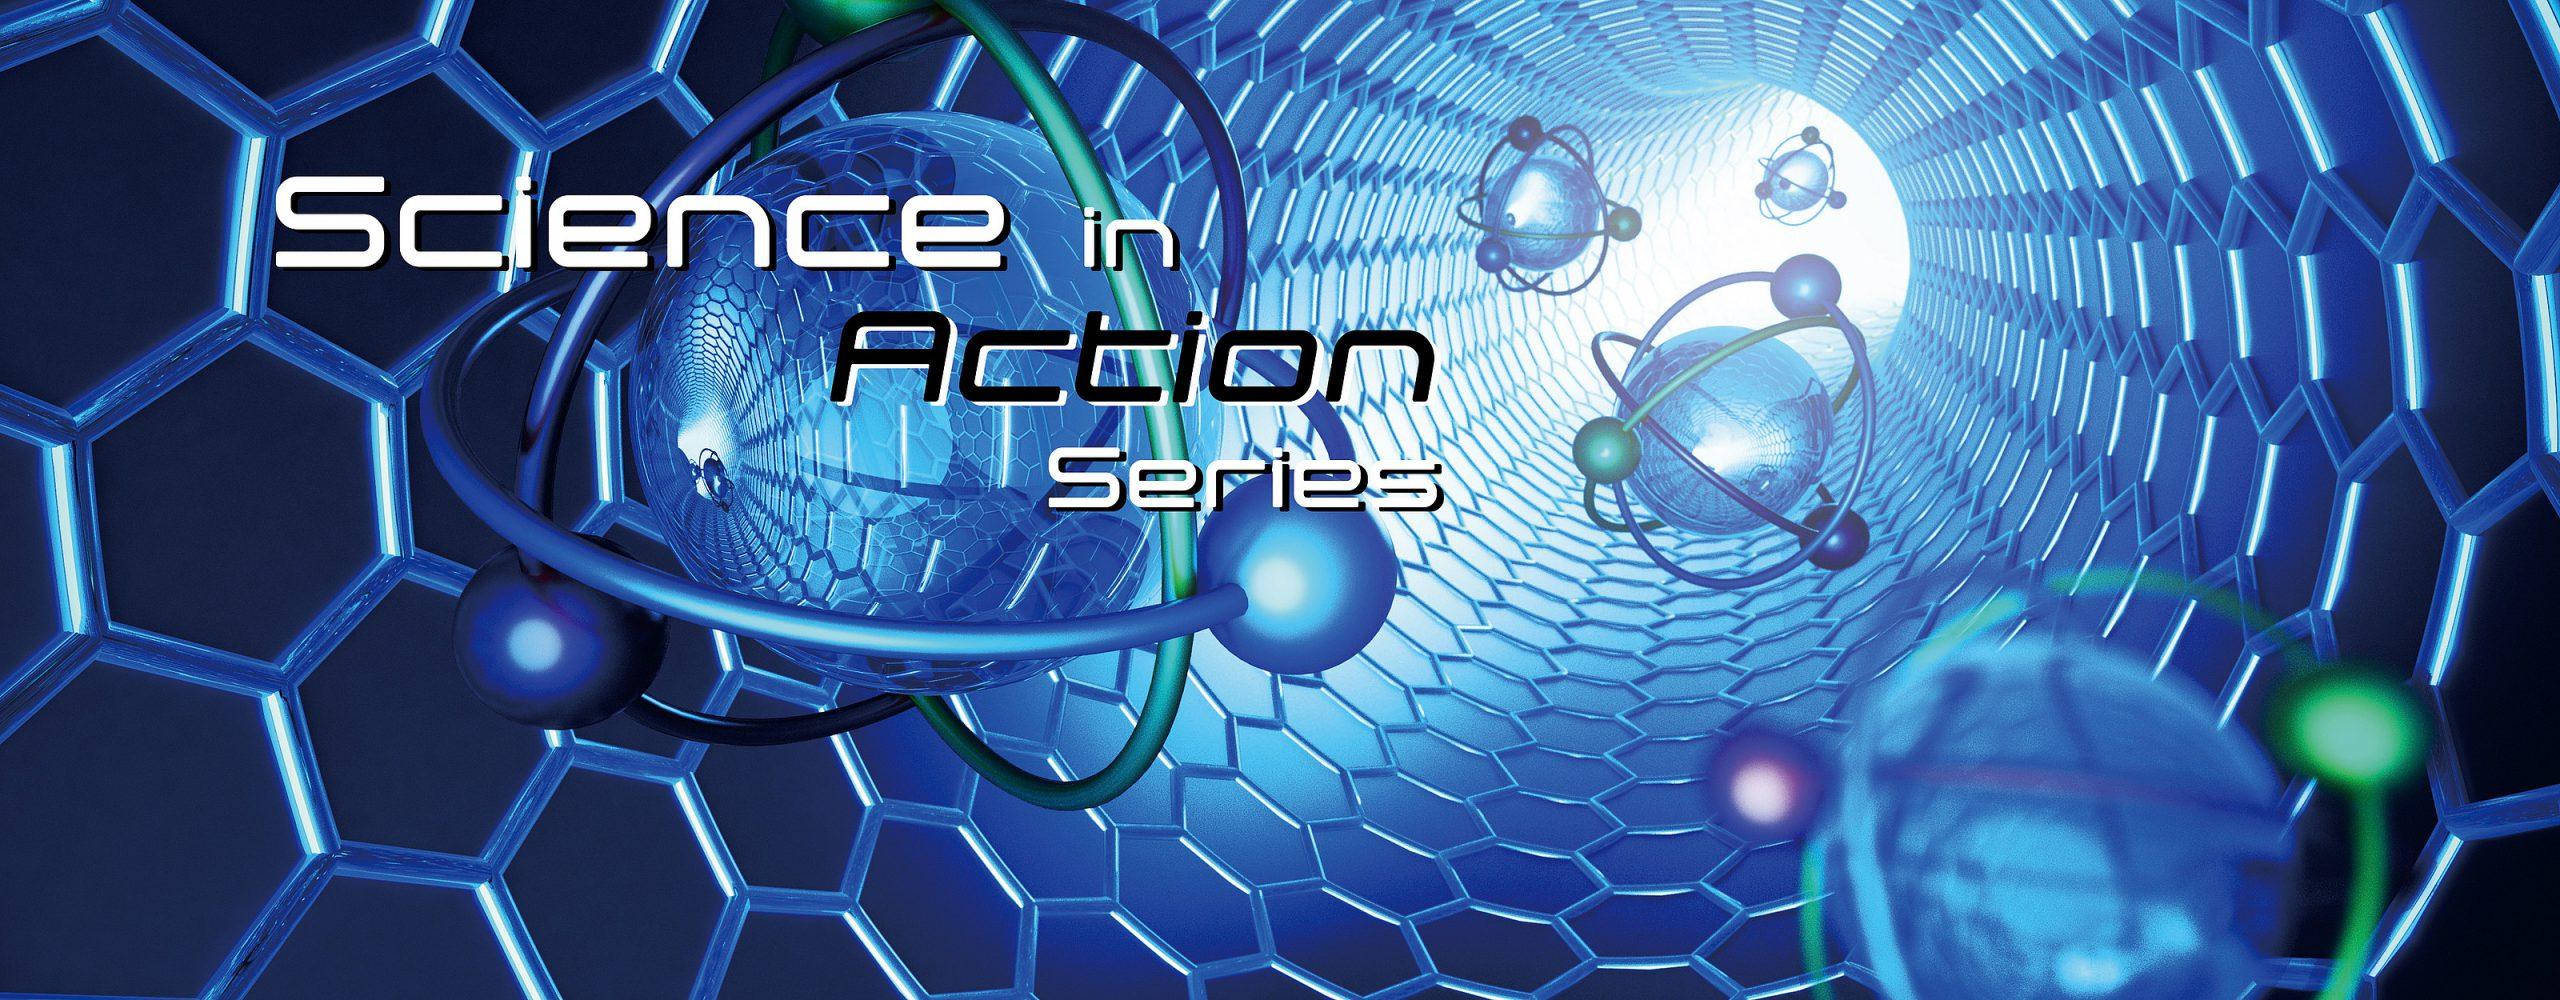 Horiba Features MXenes in Their Science in Action Series